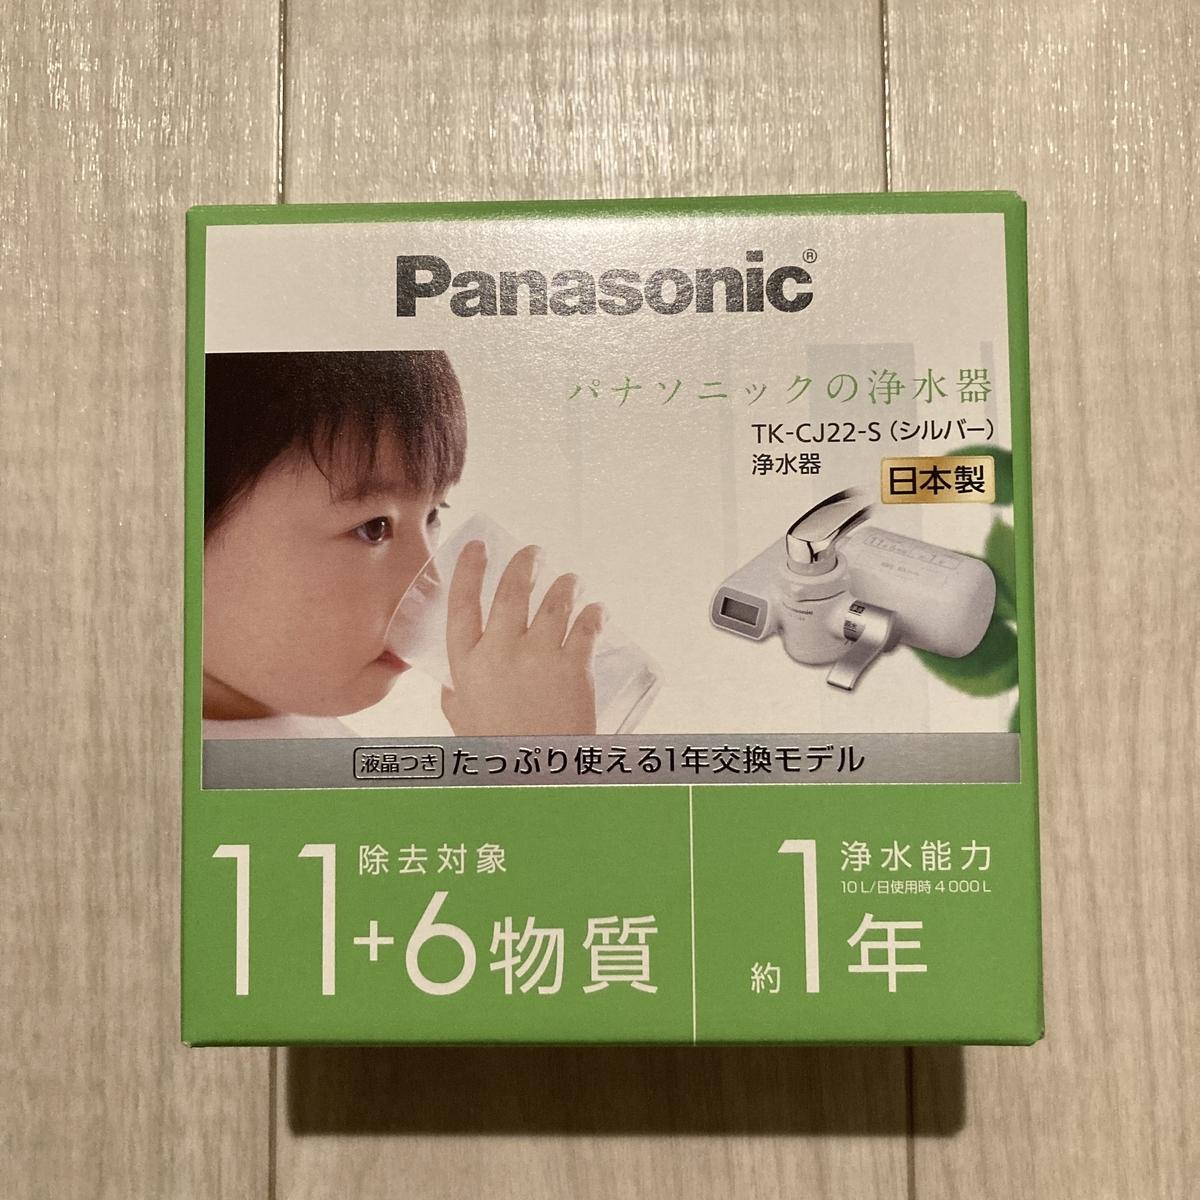 Panasonic 浄水器 TK-CJ23-H TK-CJ22-S トレビーノ 軟水 天然水 カートリッジ 節約 除去 水質 健康